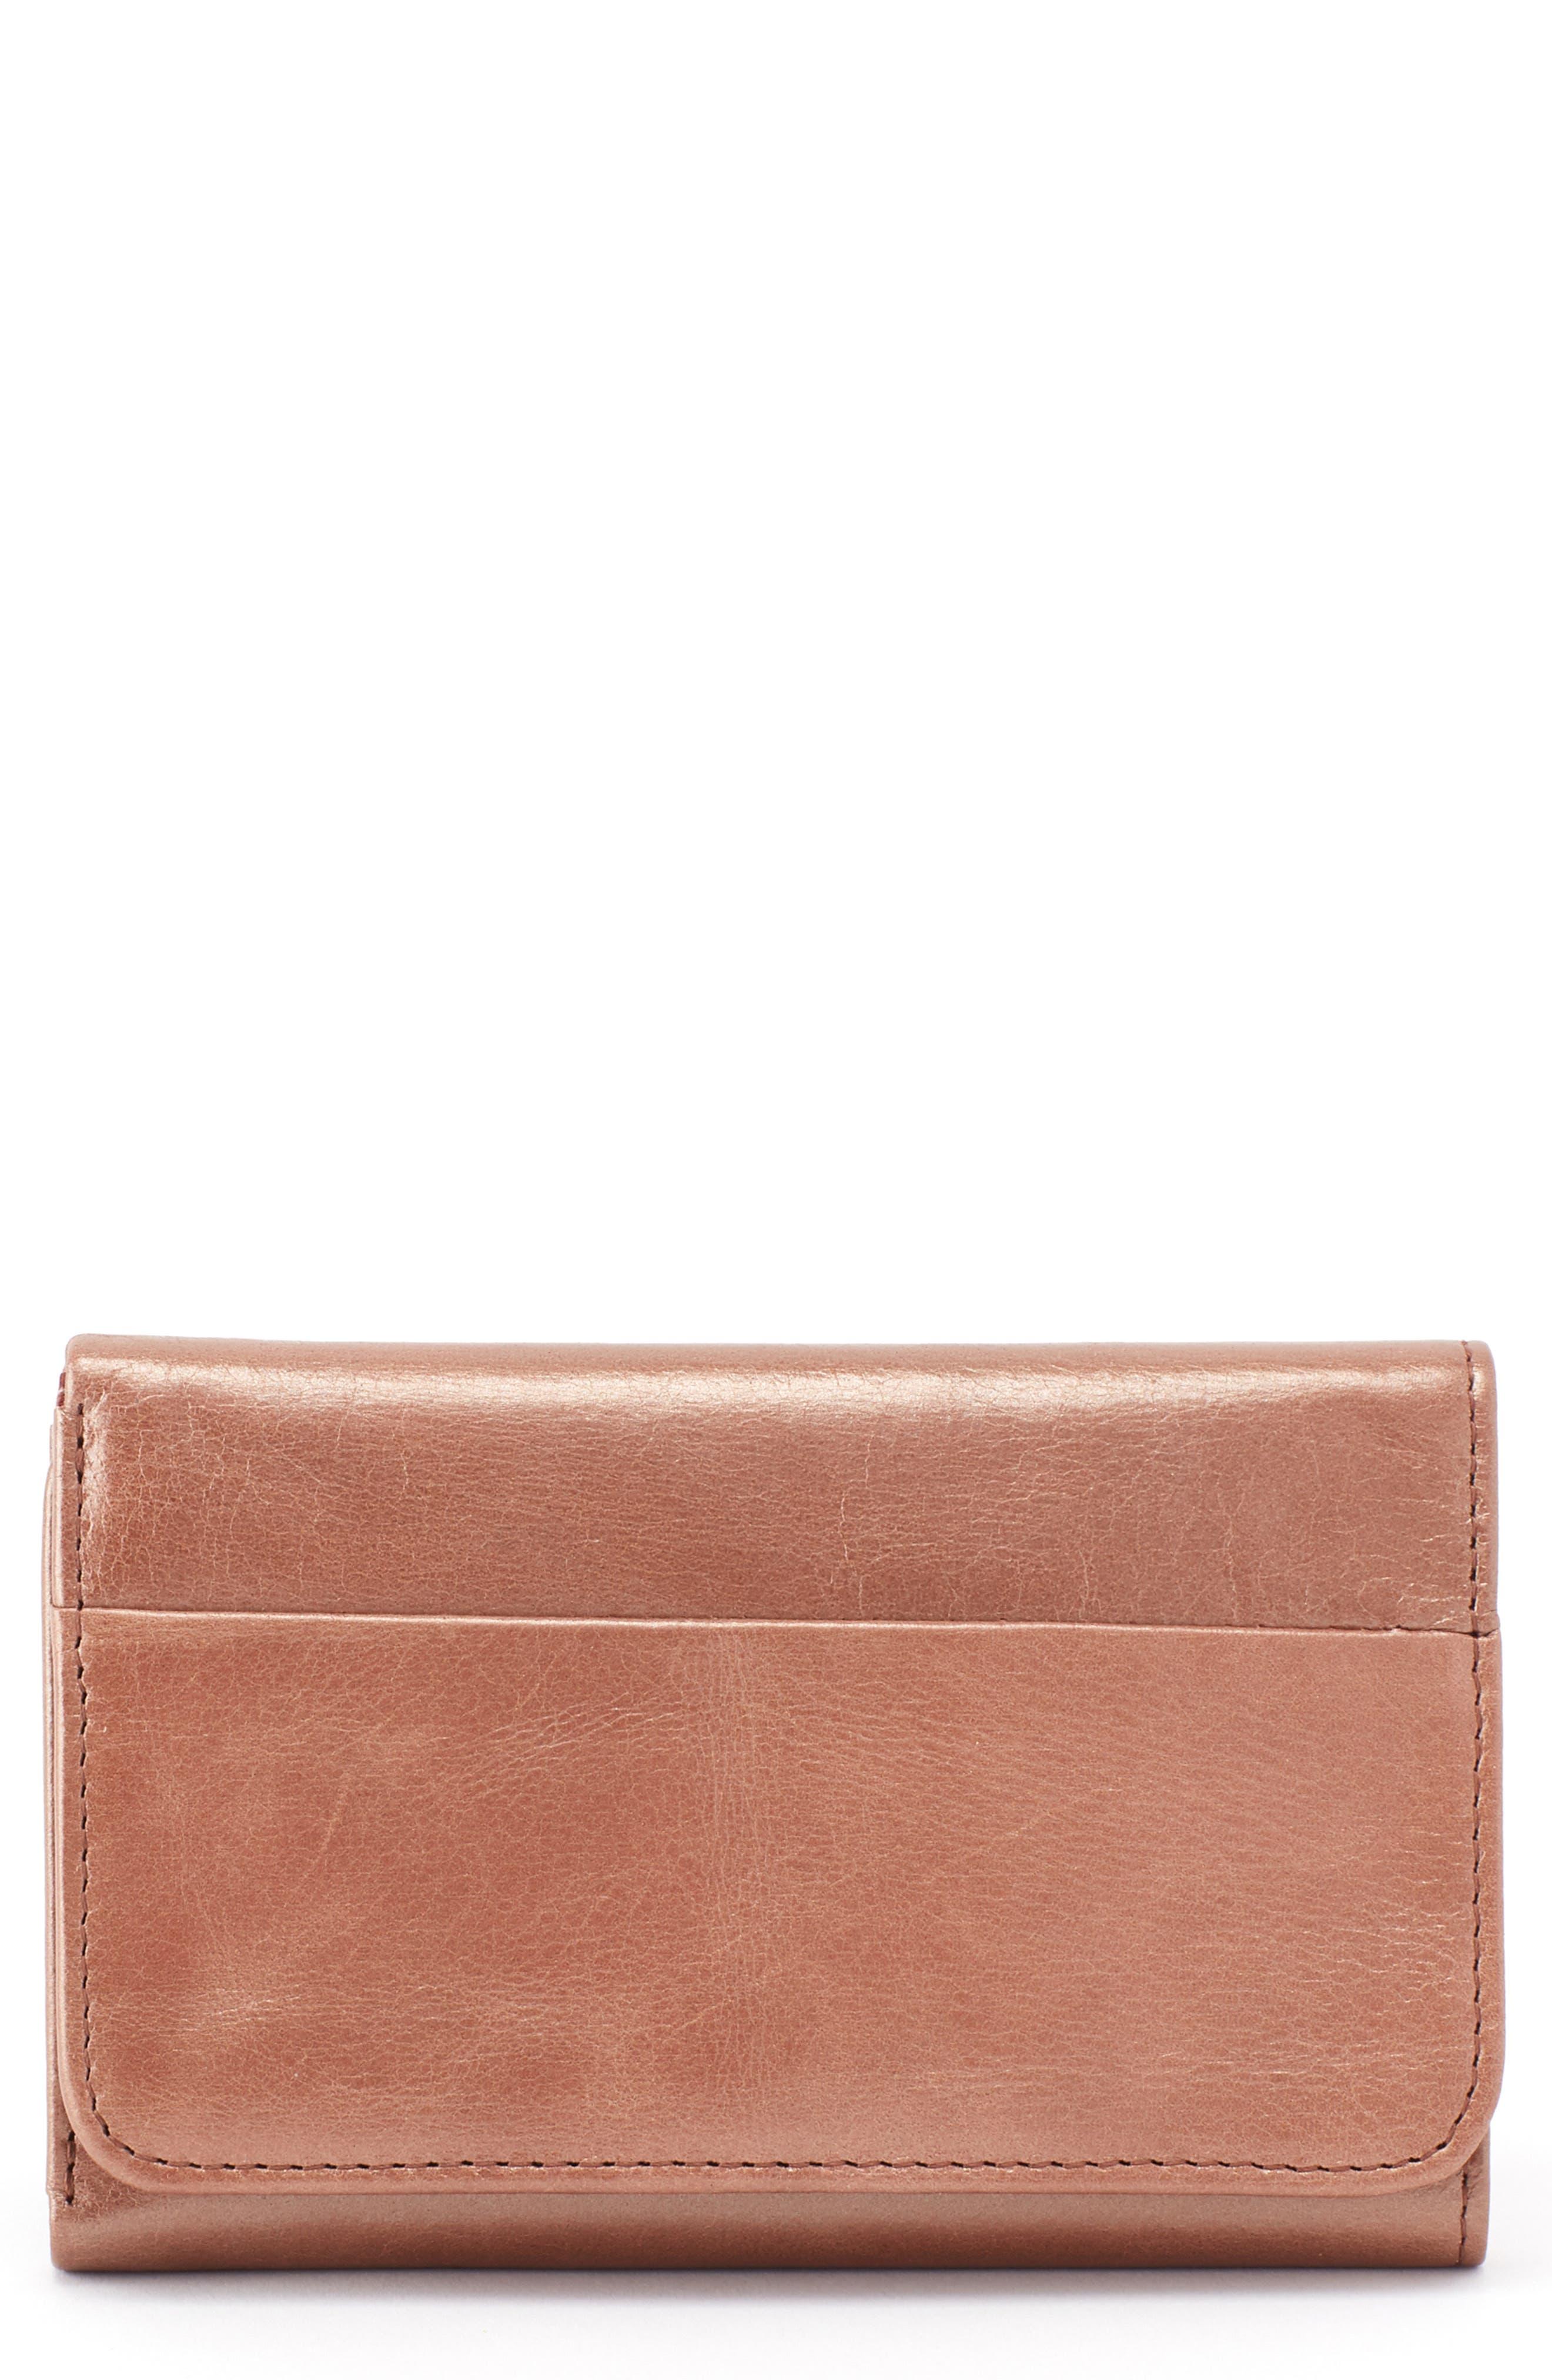 Jill Trifold Wallet,                         Main,                         color, CAMEO